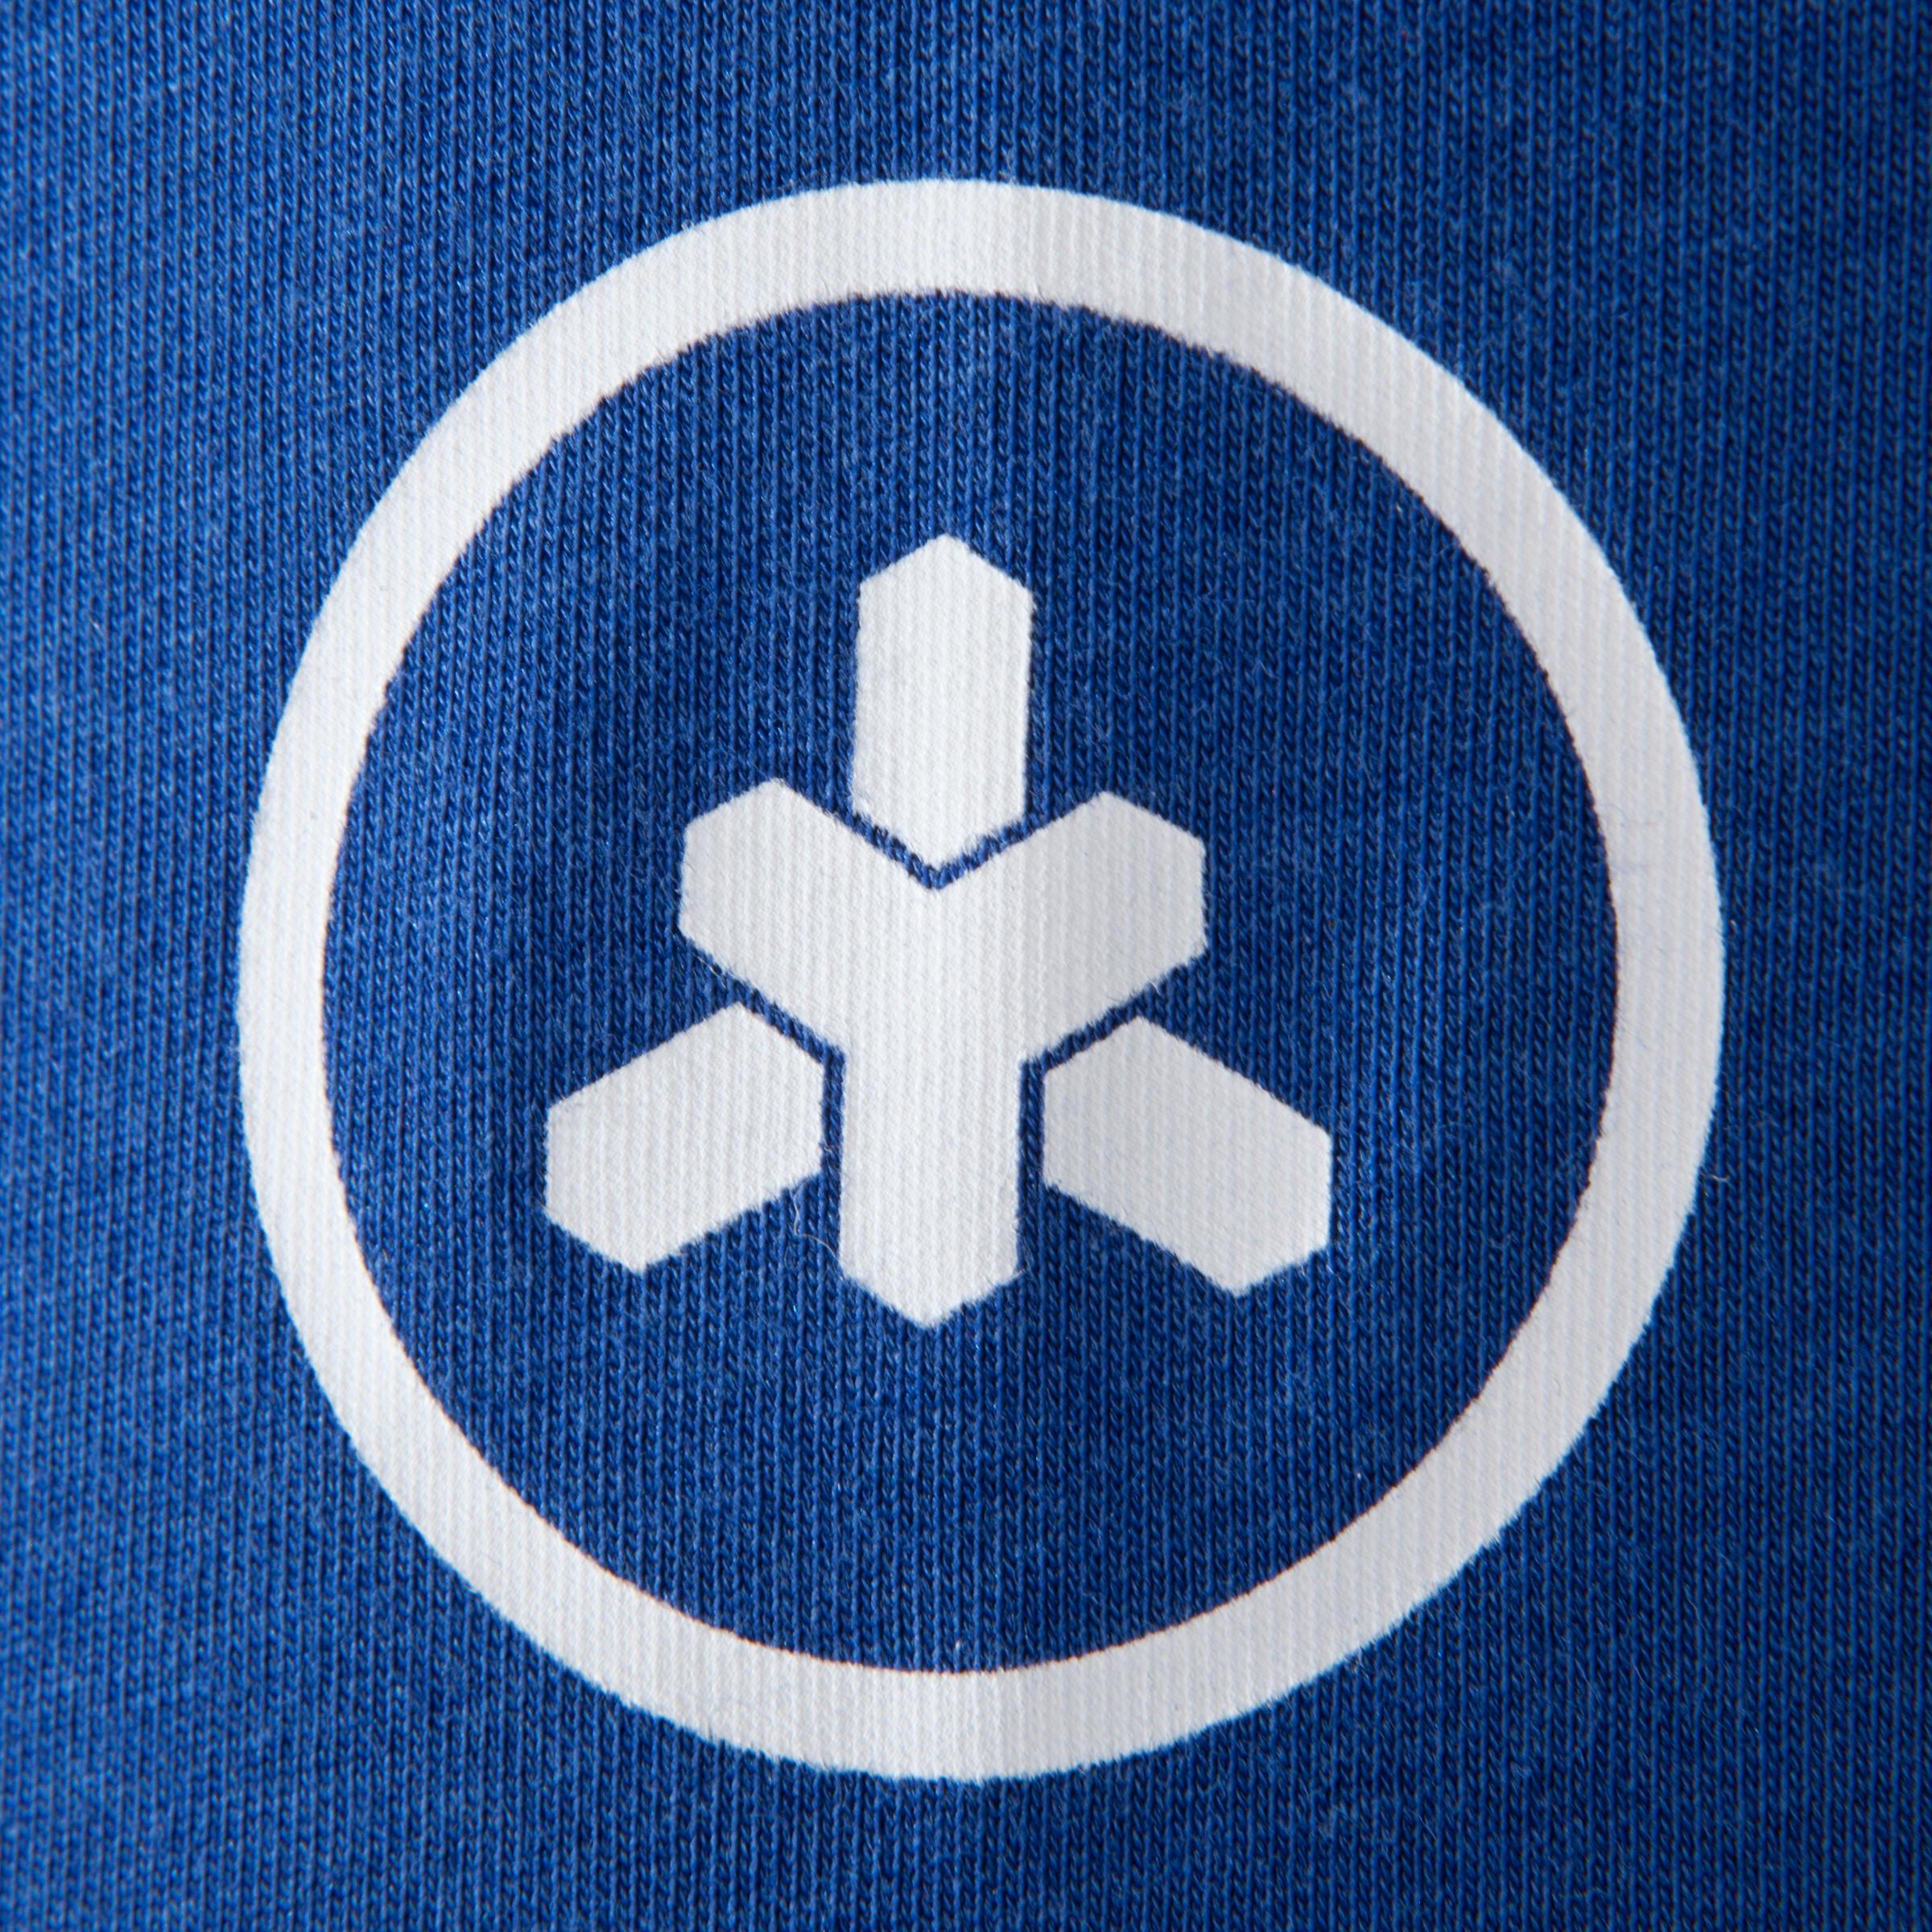 500 Cross Training T-Shirt - Blue